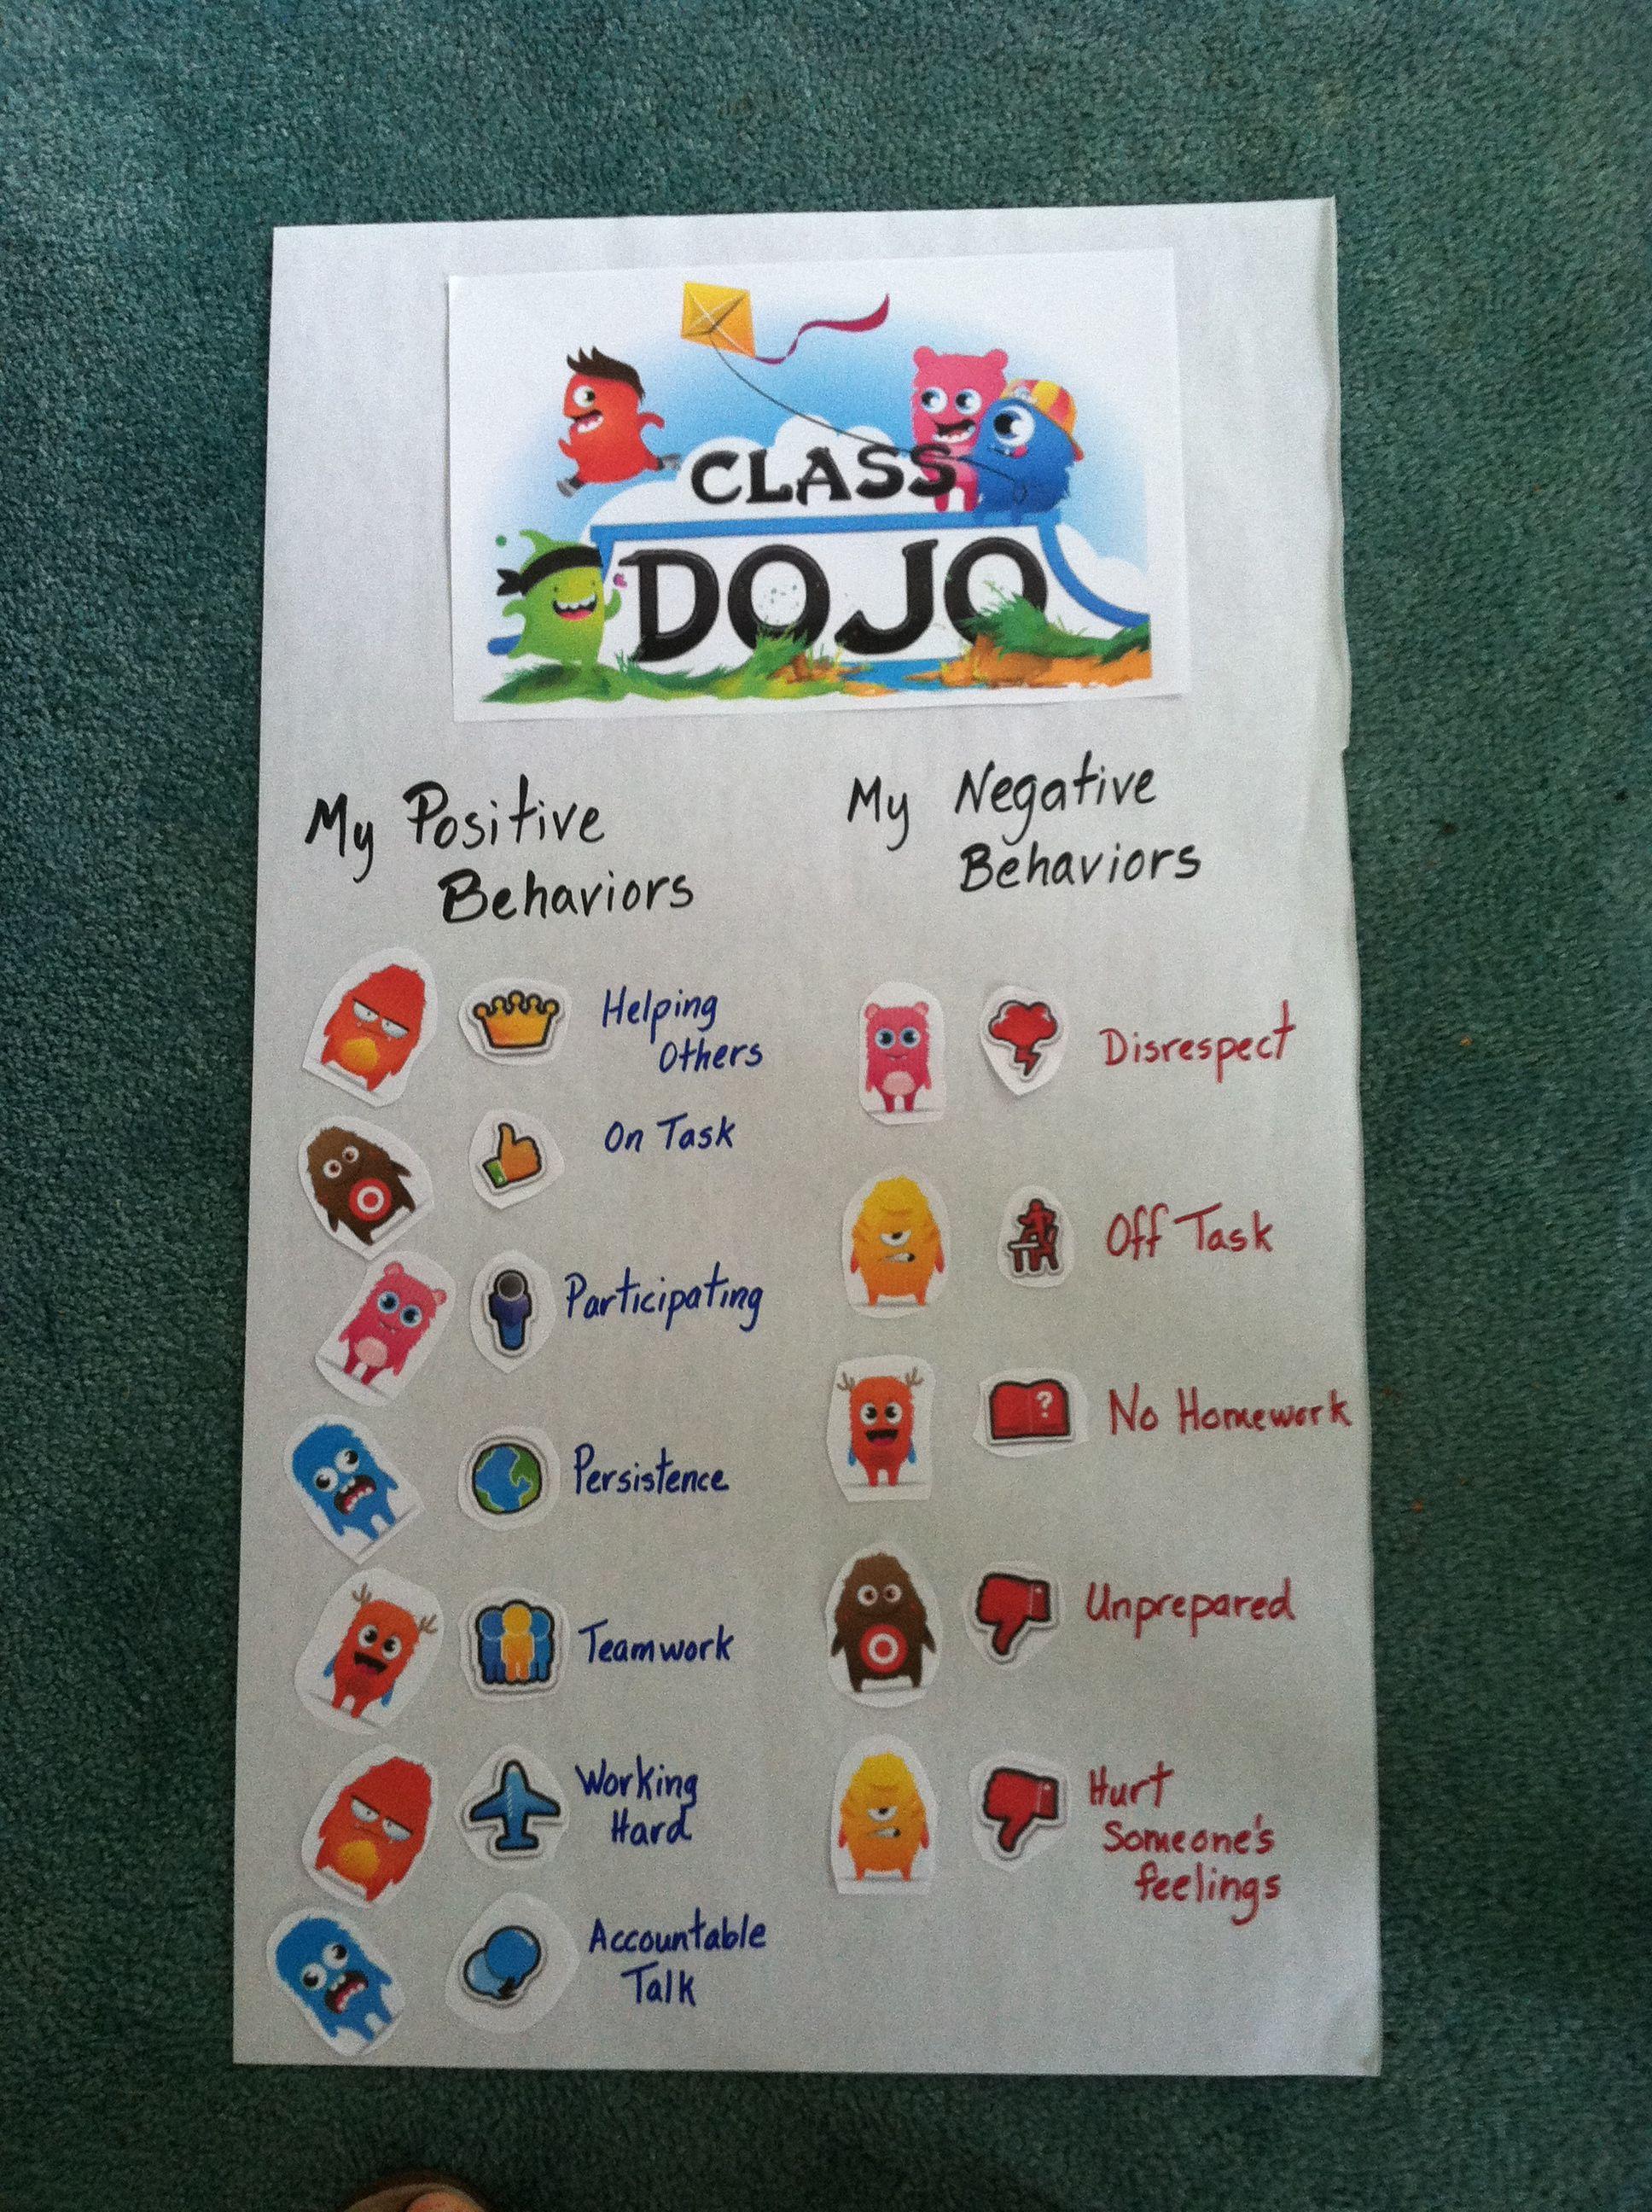 class dojo poster of positive and negative behaviors